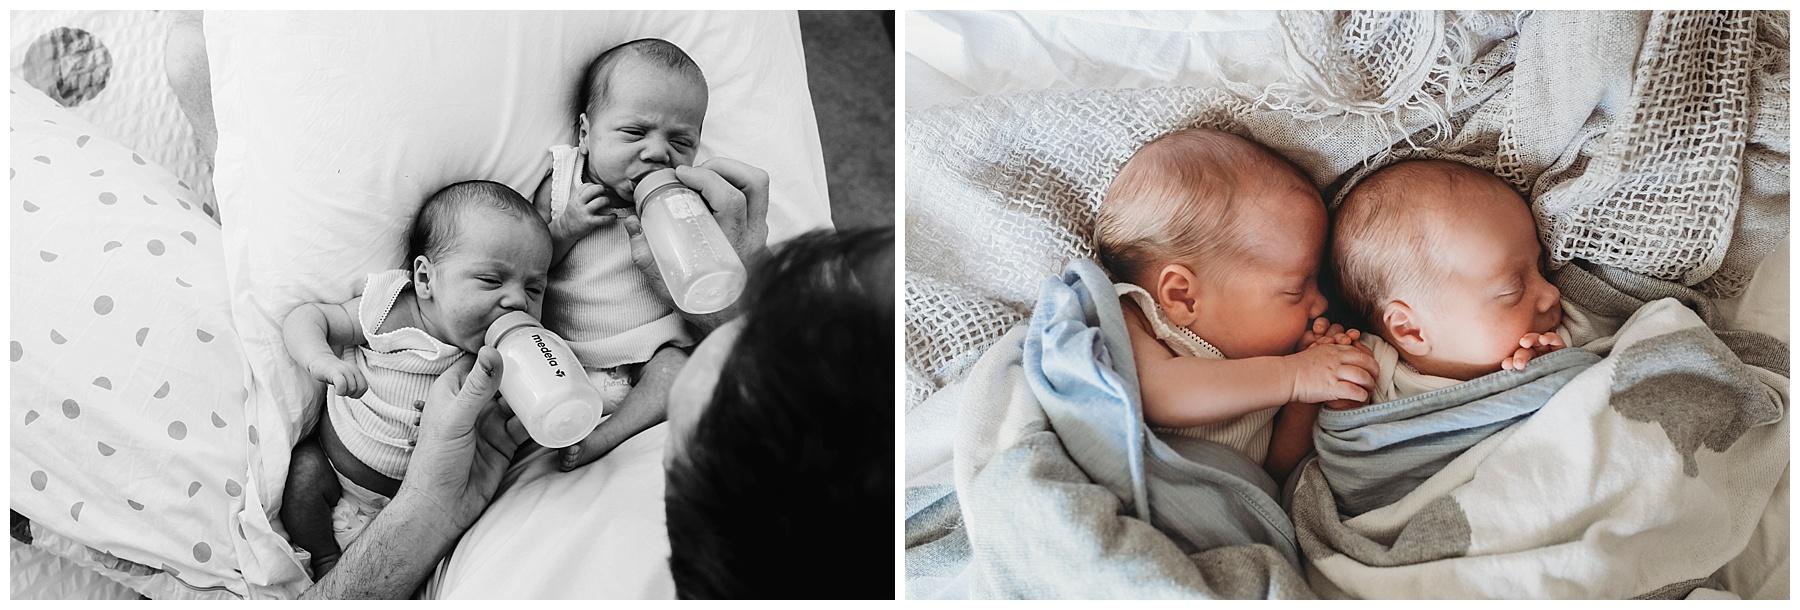 South Gippsland Newborn photographer - twins - berwick